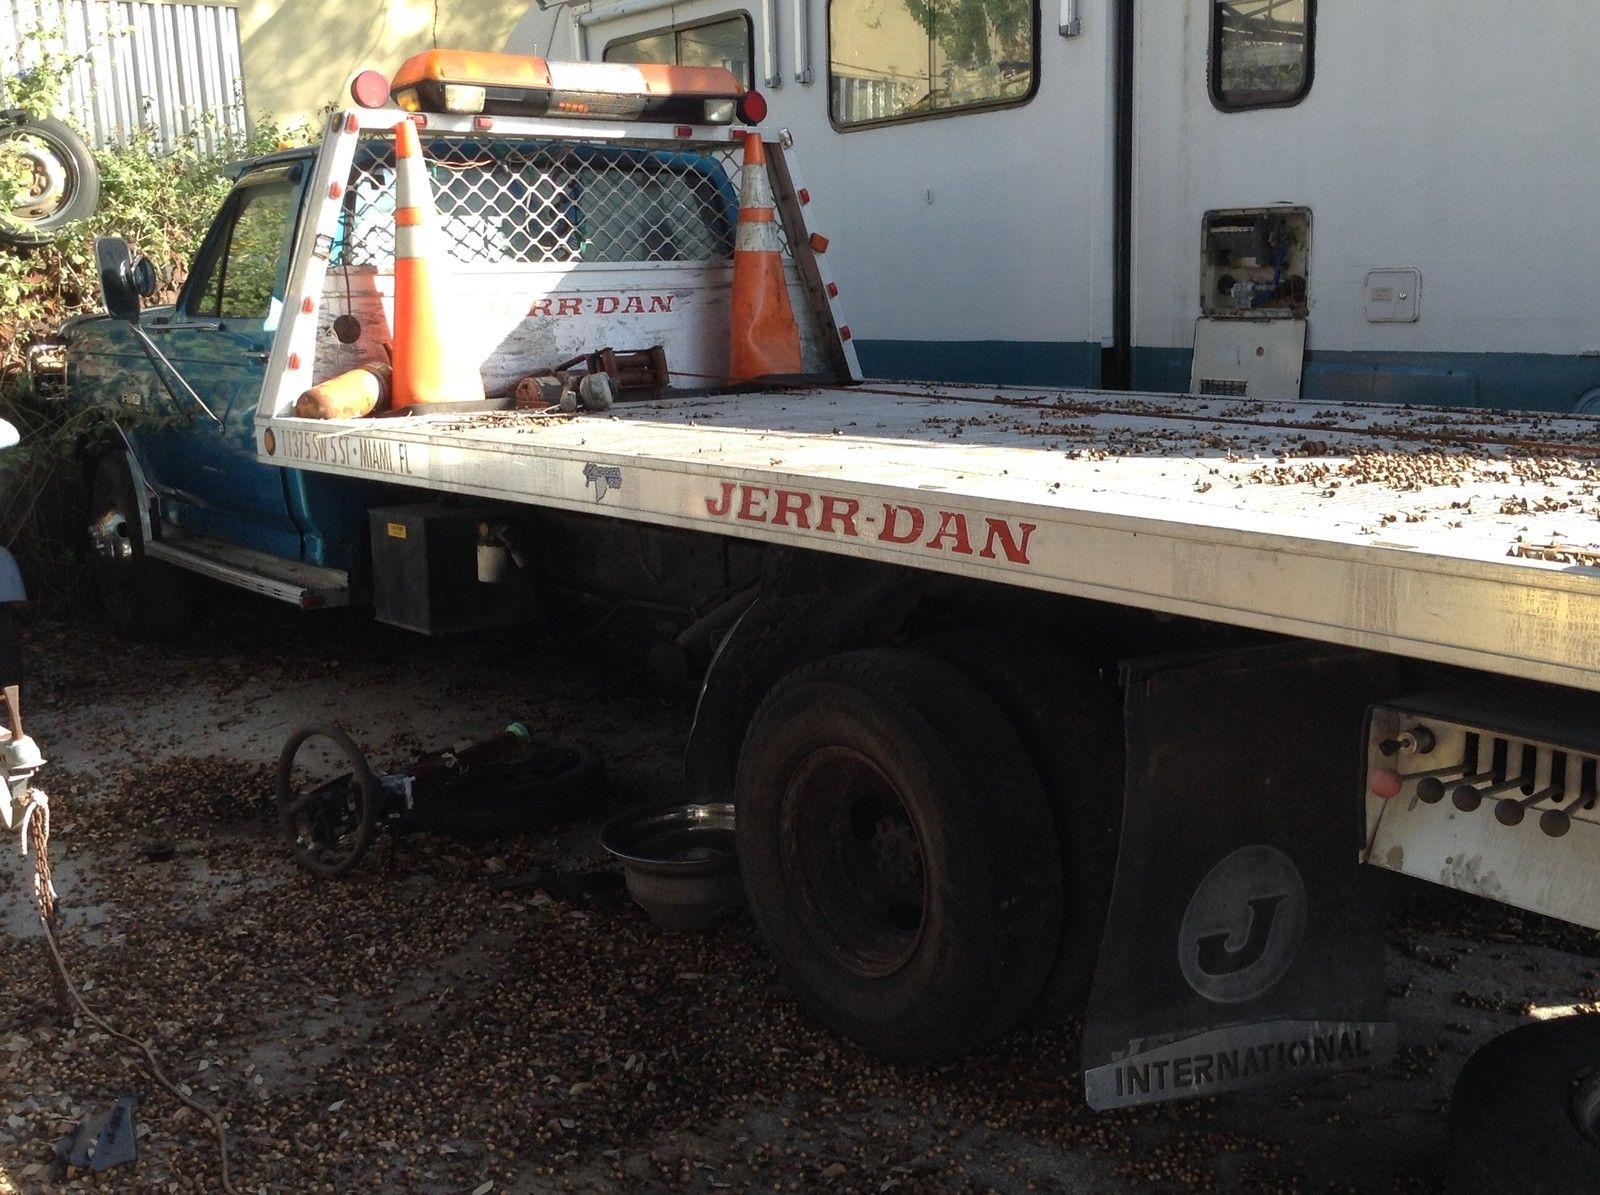 Ford Super Duty Rollback Aluminum Flat Bed Tow Truck